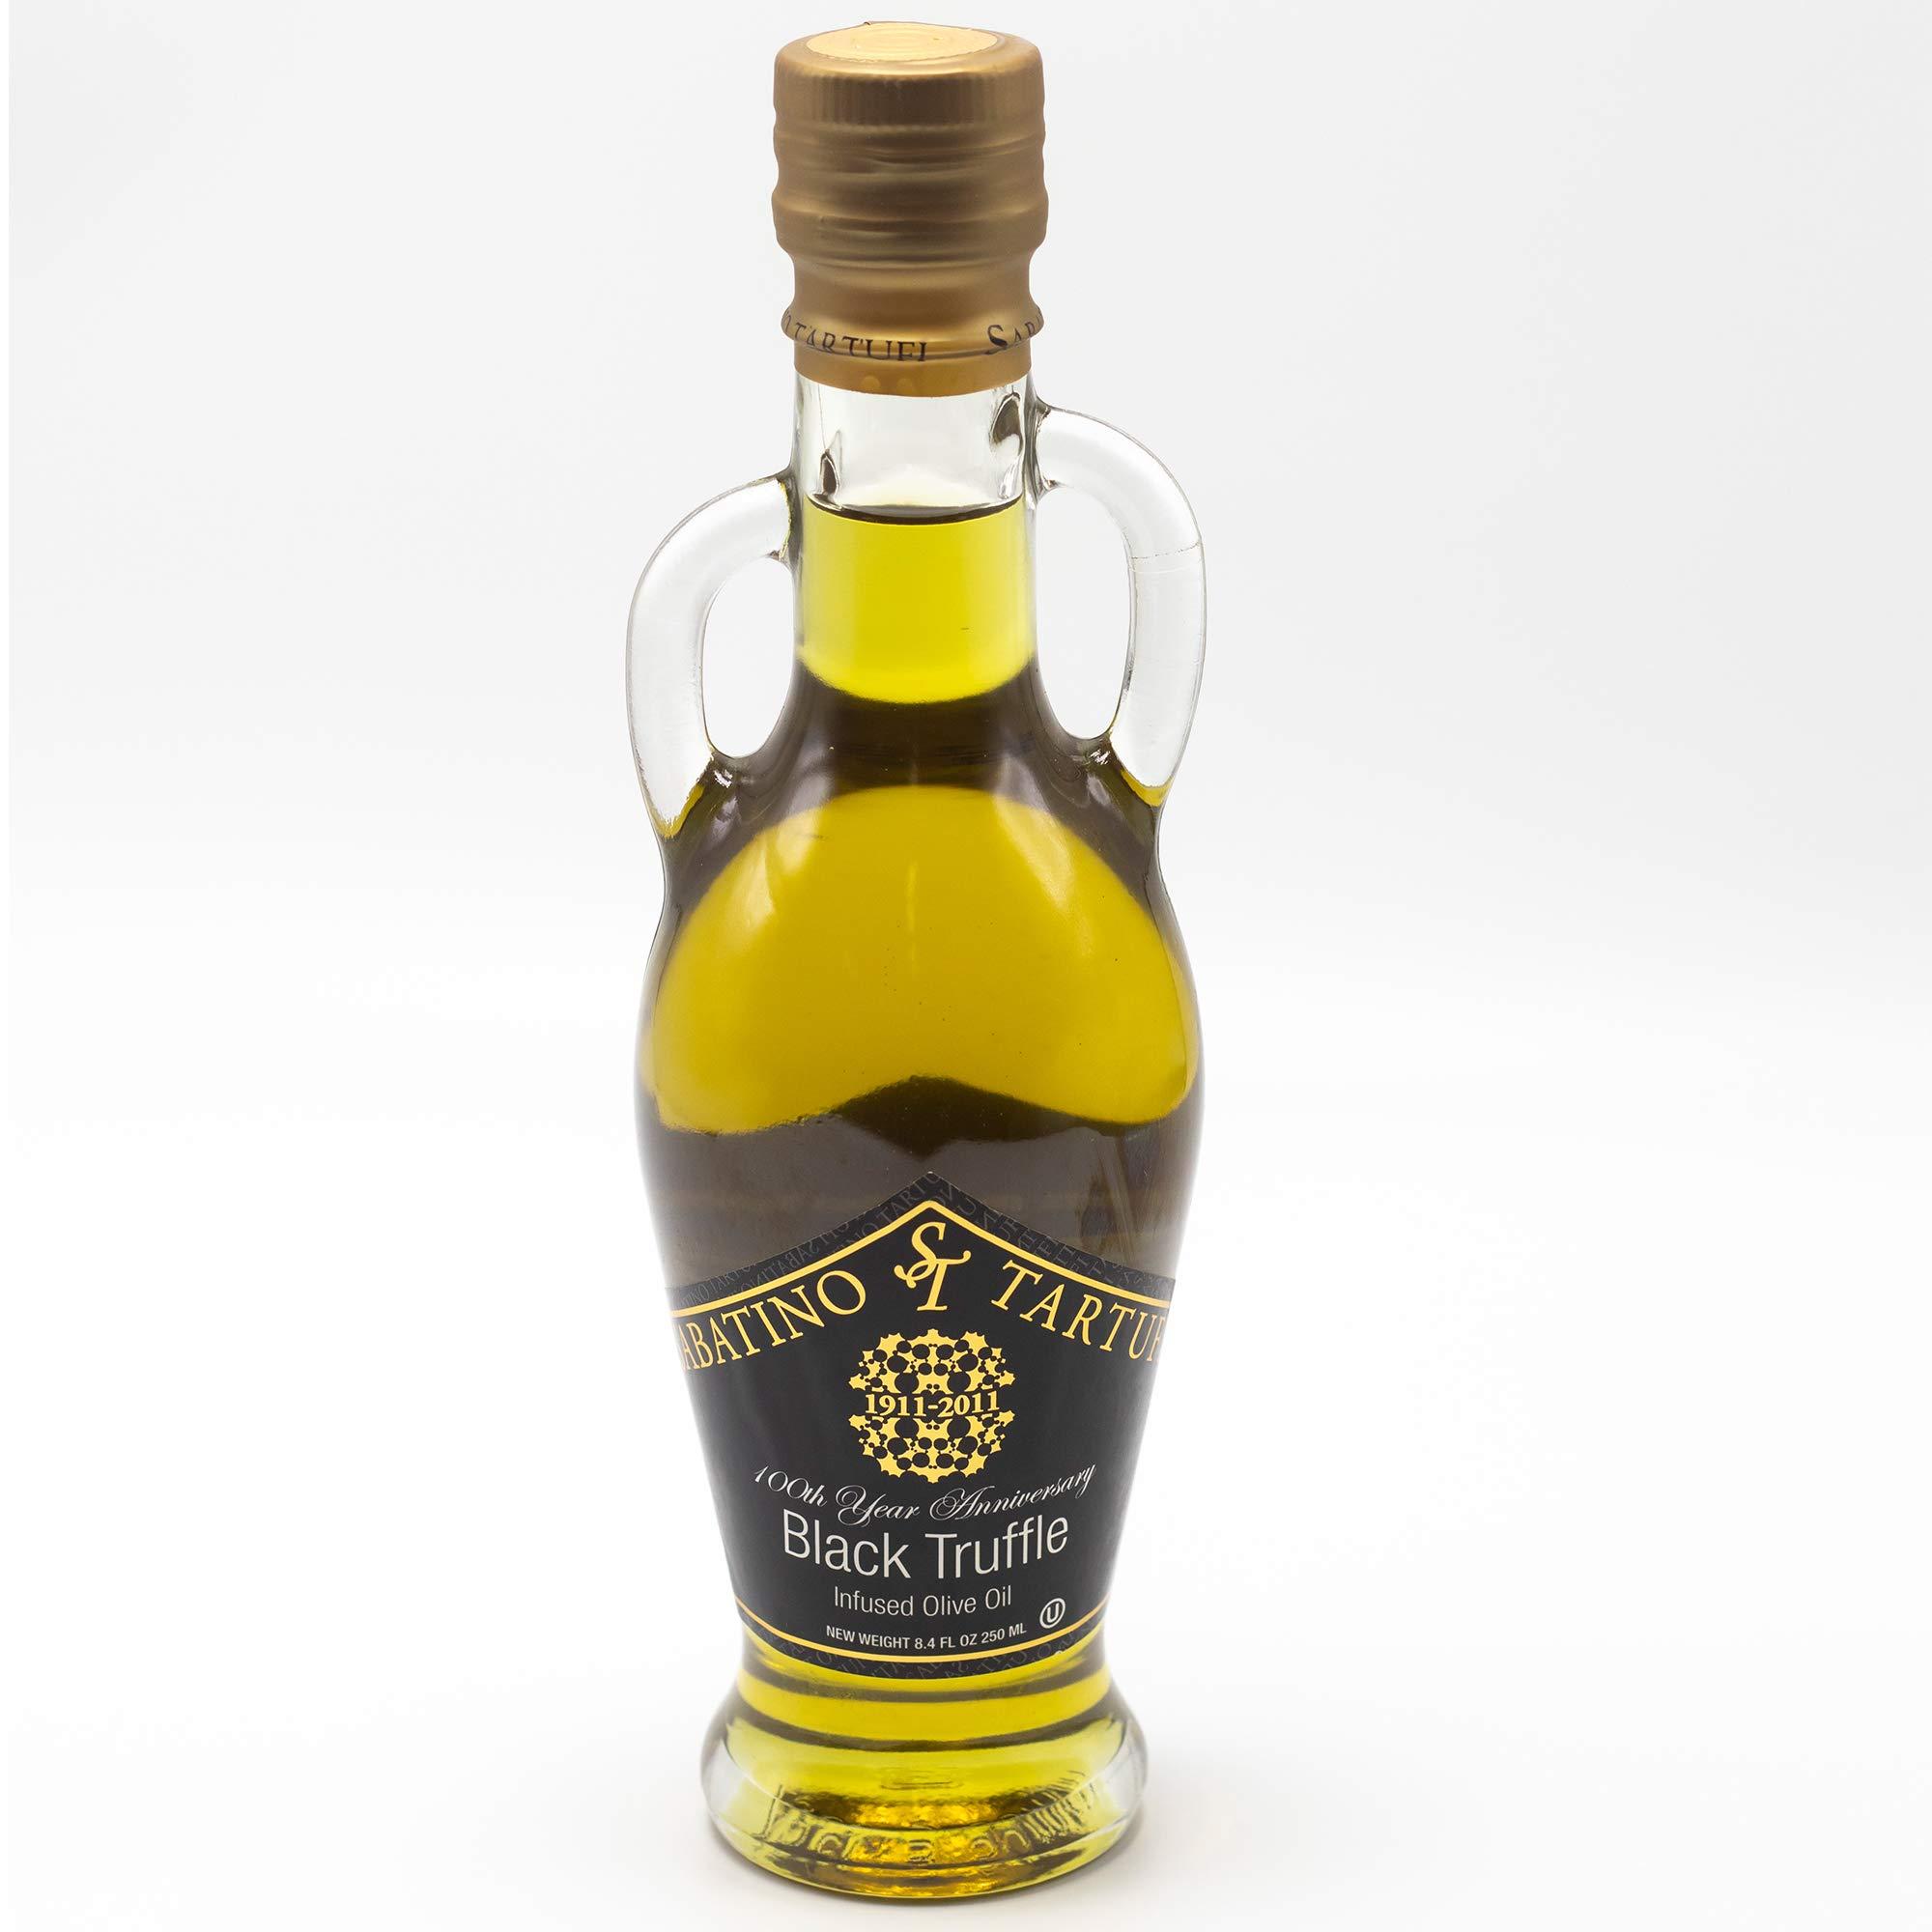 Sabatino Tartufi Black Truffle Infused Olive Oil, 8.4 Ounce